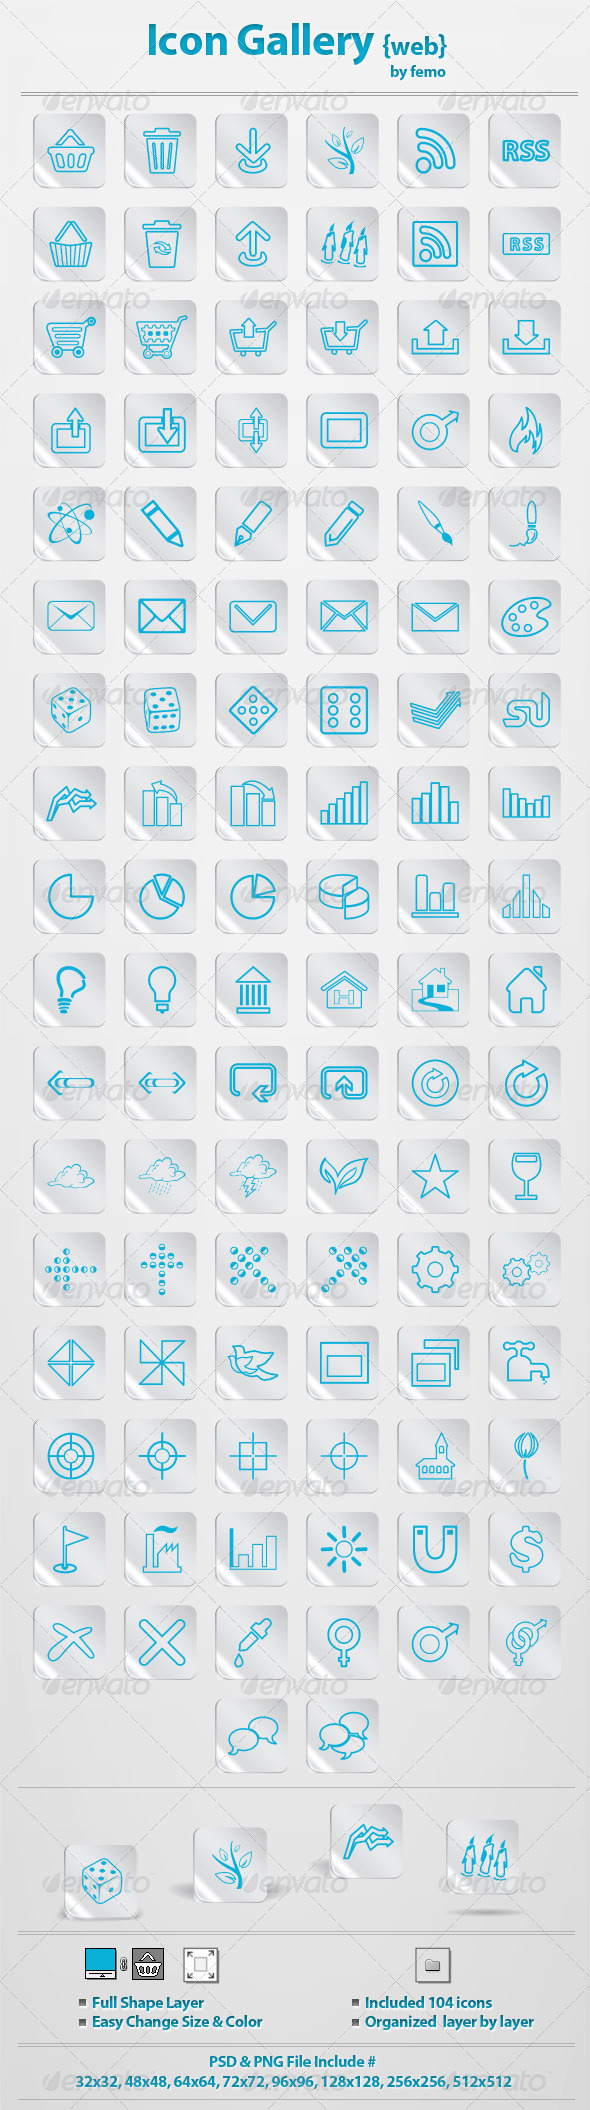 GraphicRiver Icon Gallery {web} 135503